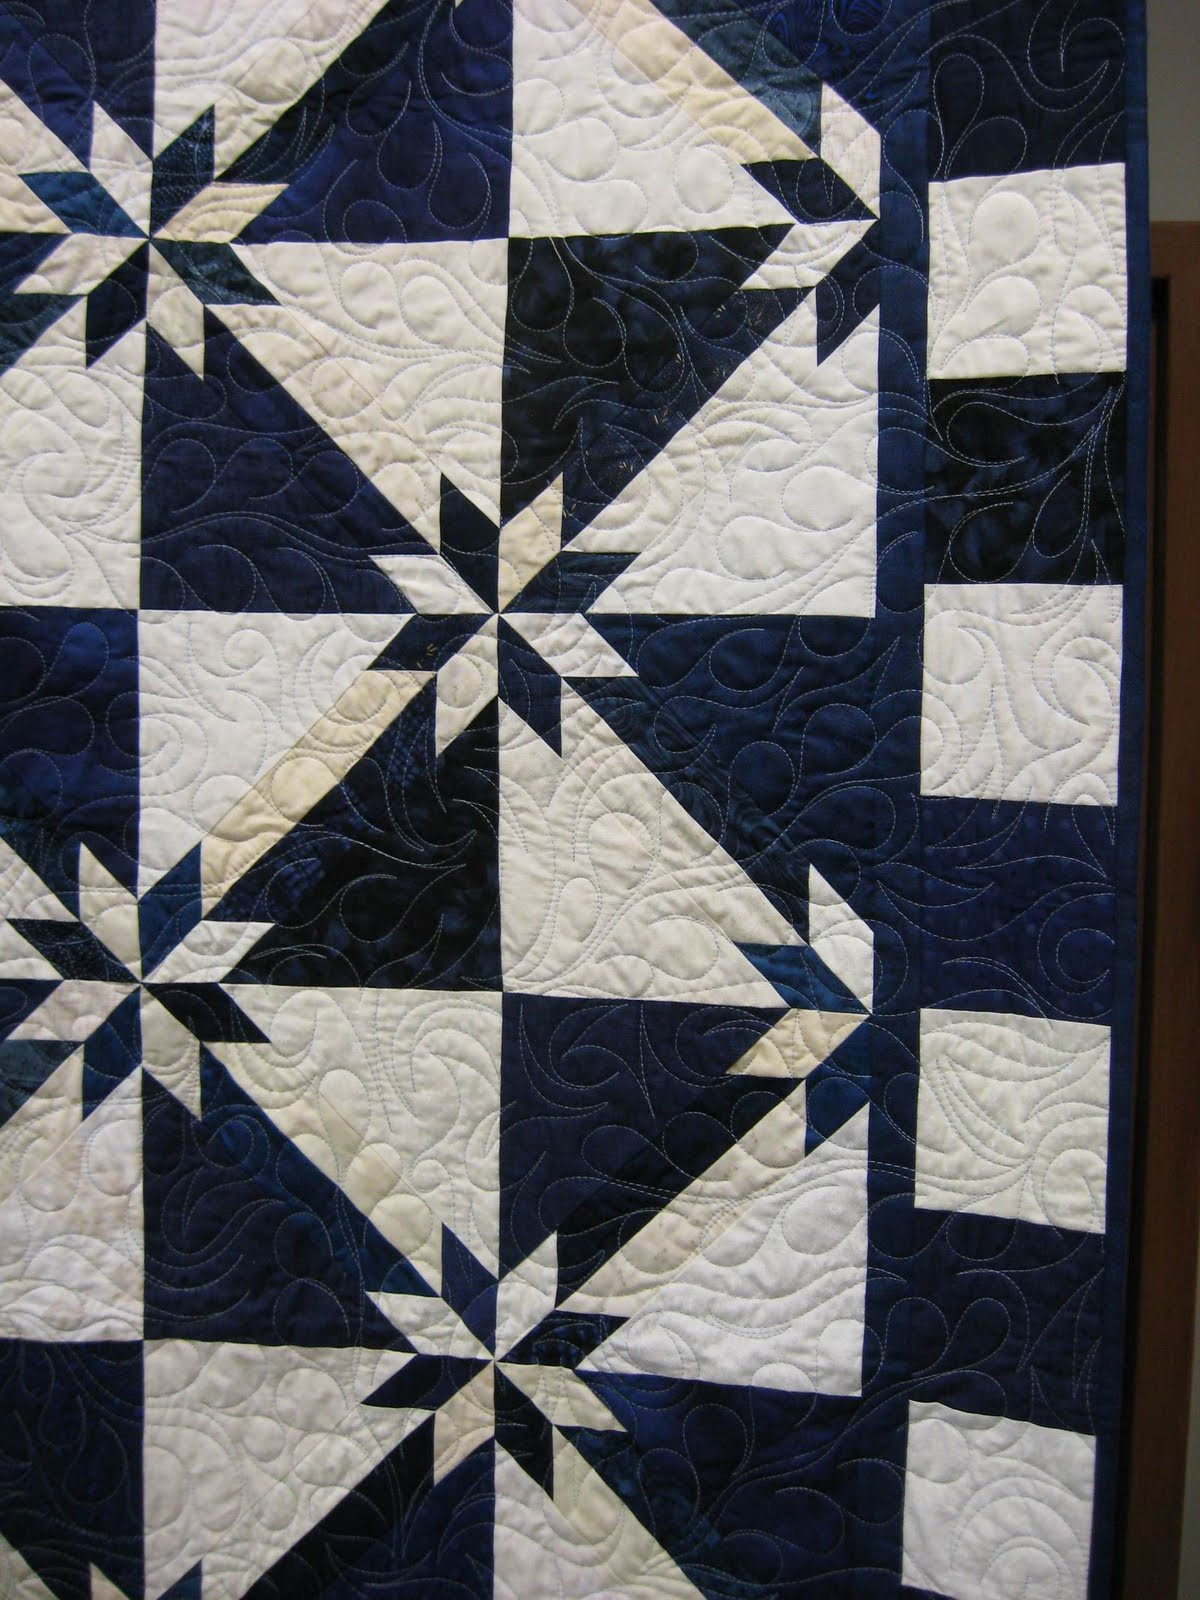 Hunters Star Pattern Patterns Gallery